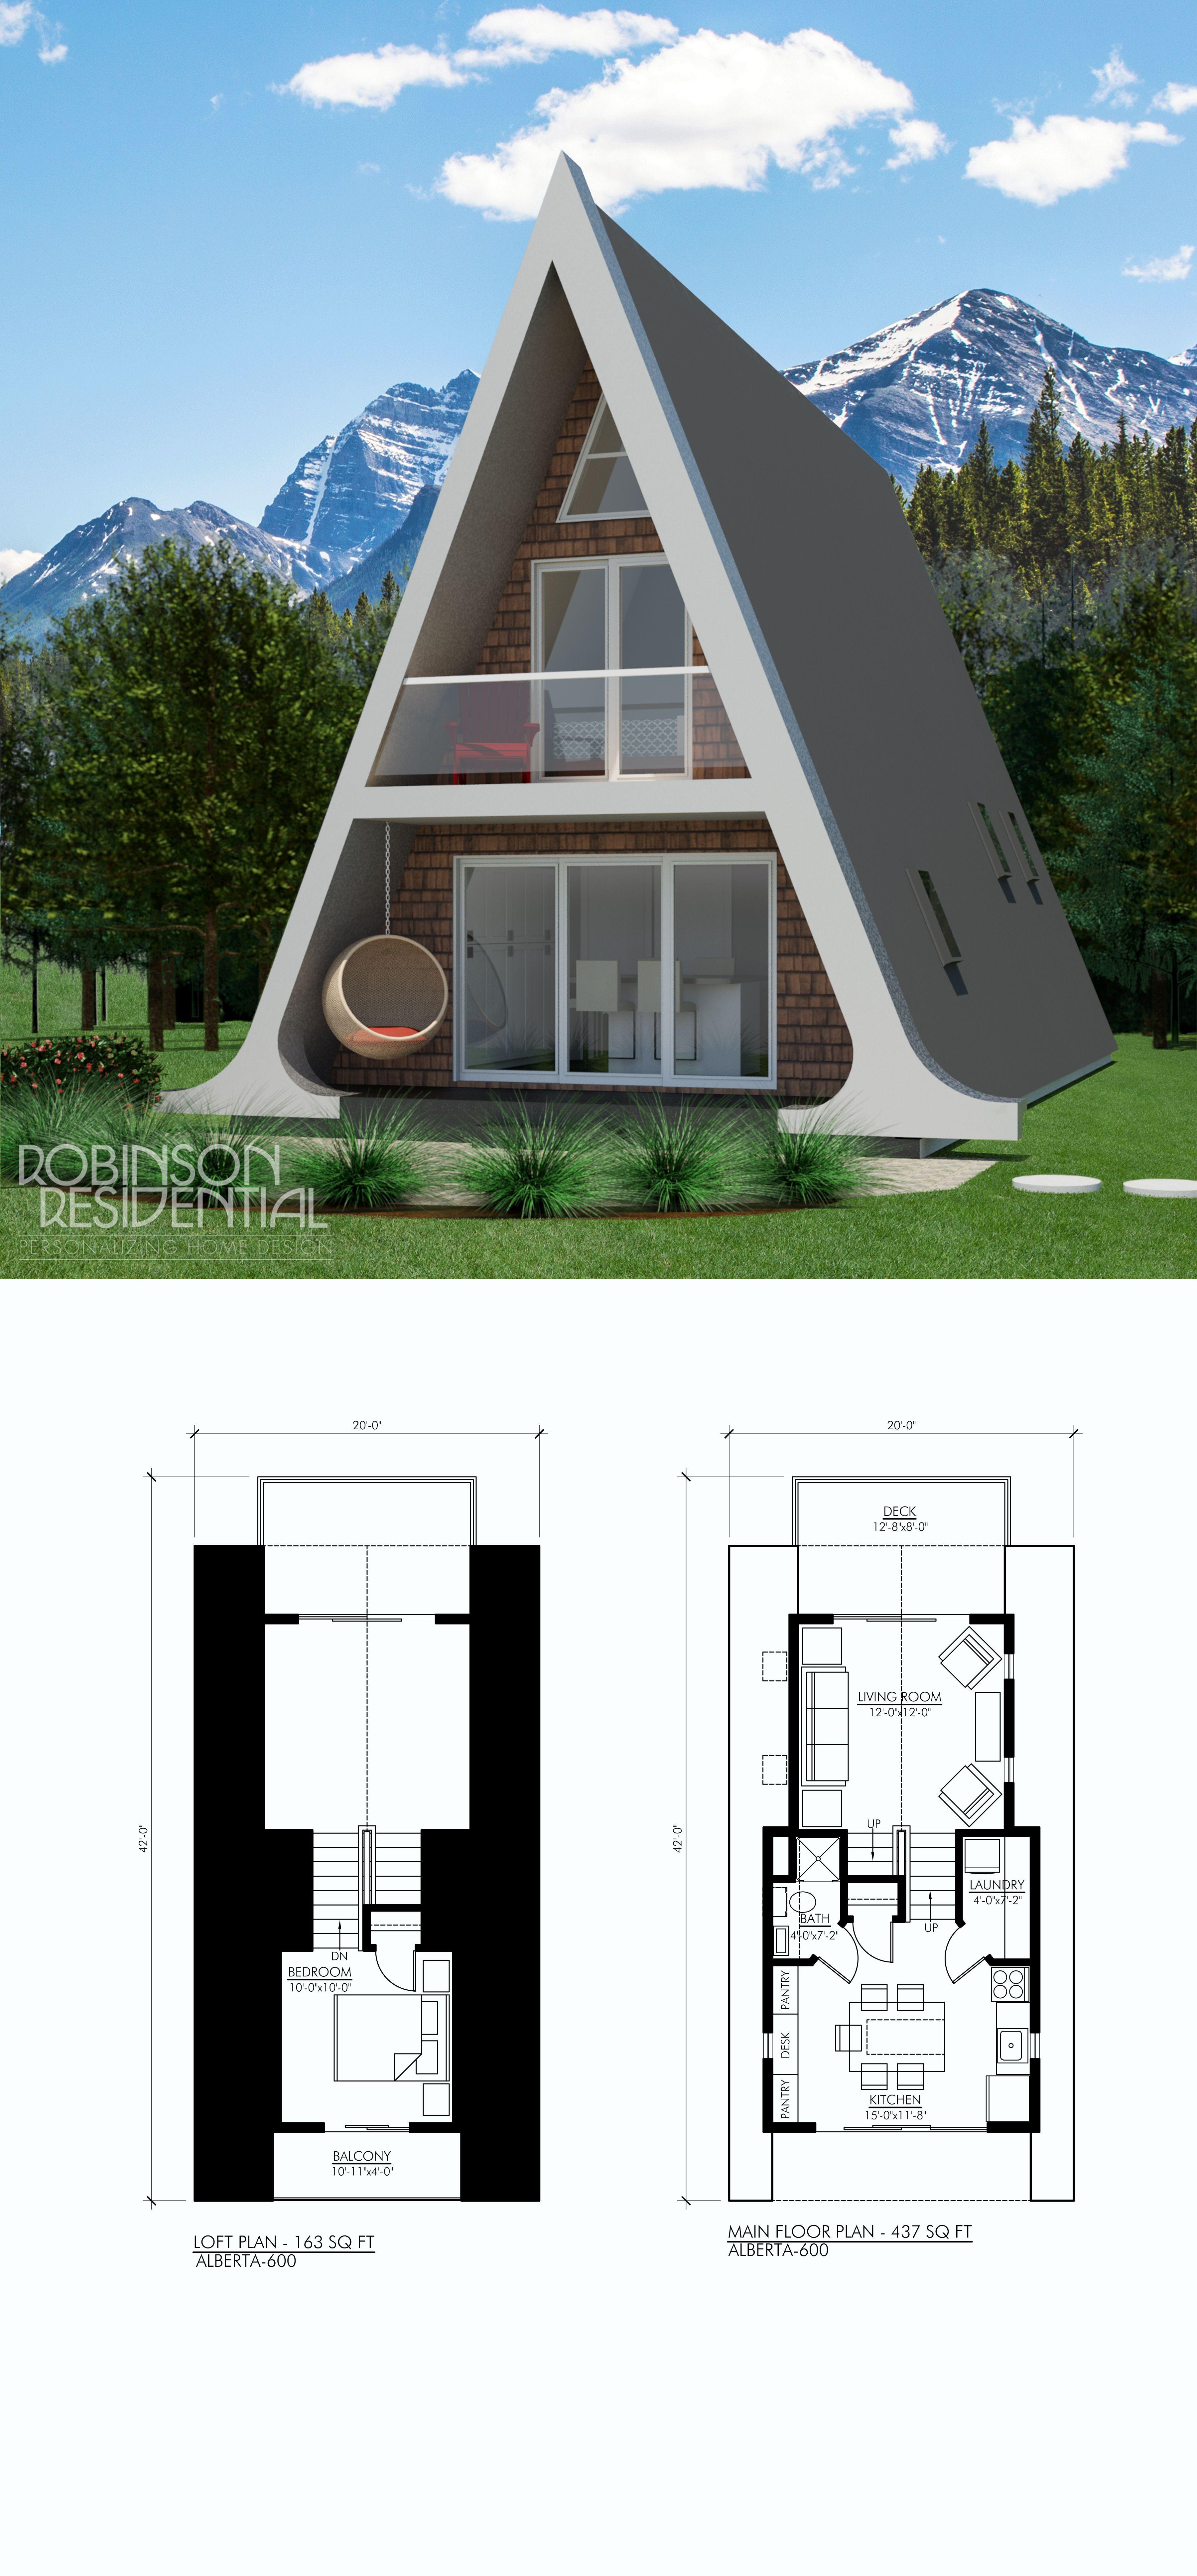 Alberta 600 A Frame House Triangle House Small House Plans